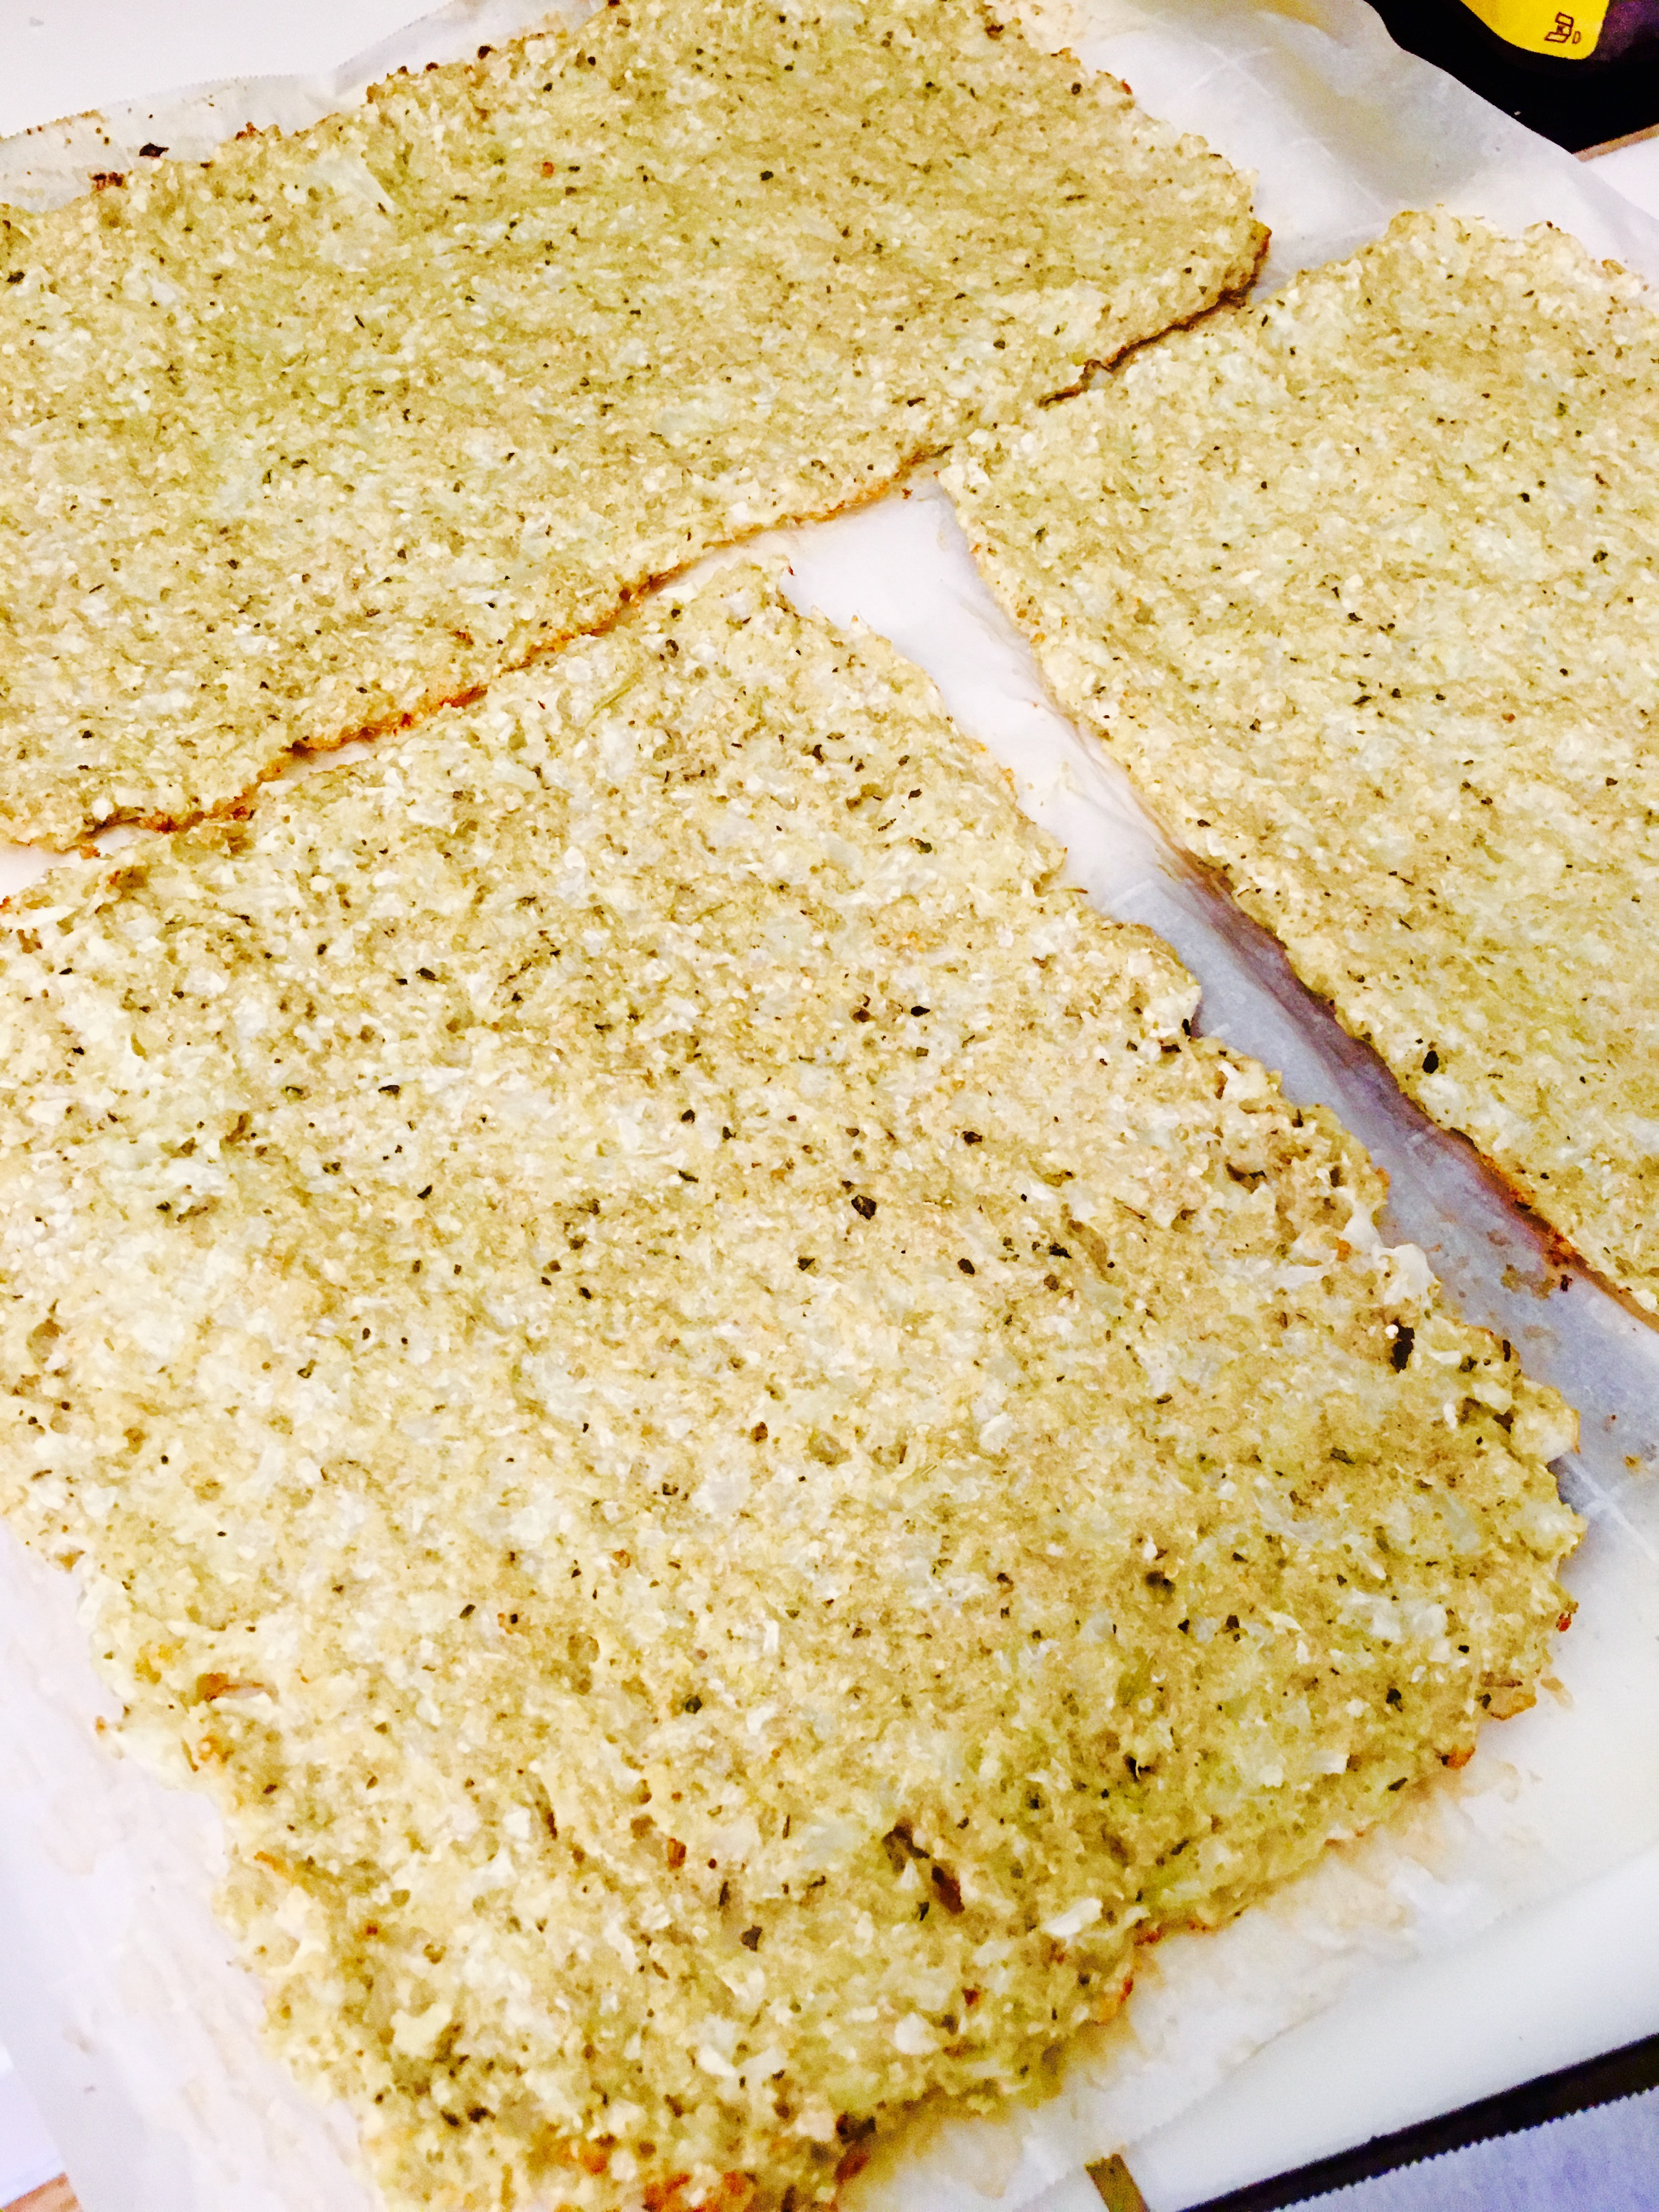 Premade Cauliflower Pizza Crust  Frozen Cauliflower Pizza Granola Cookies and More WIAW